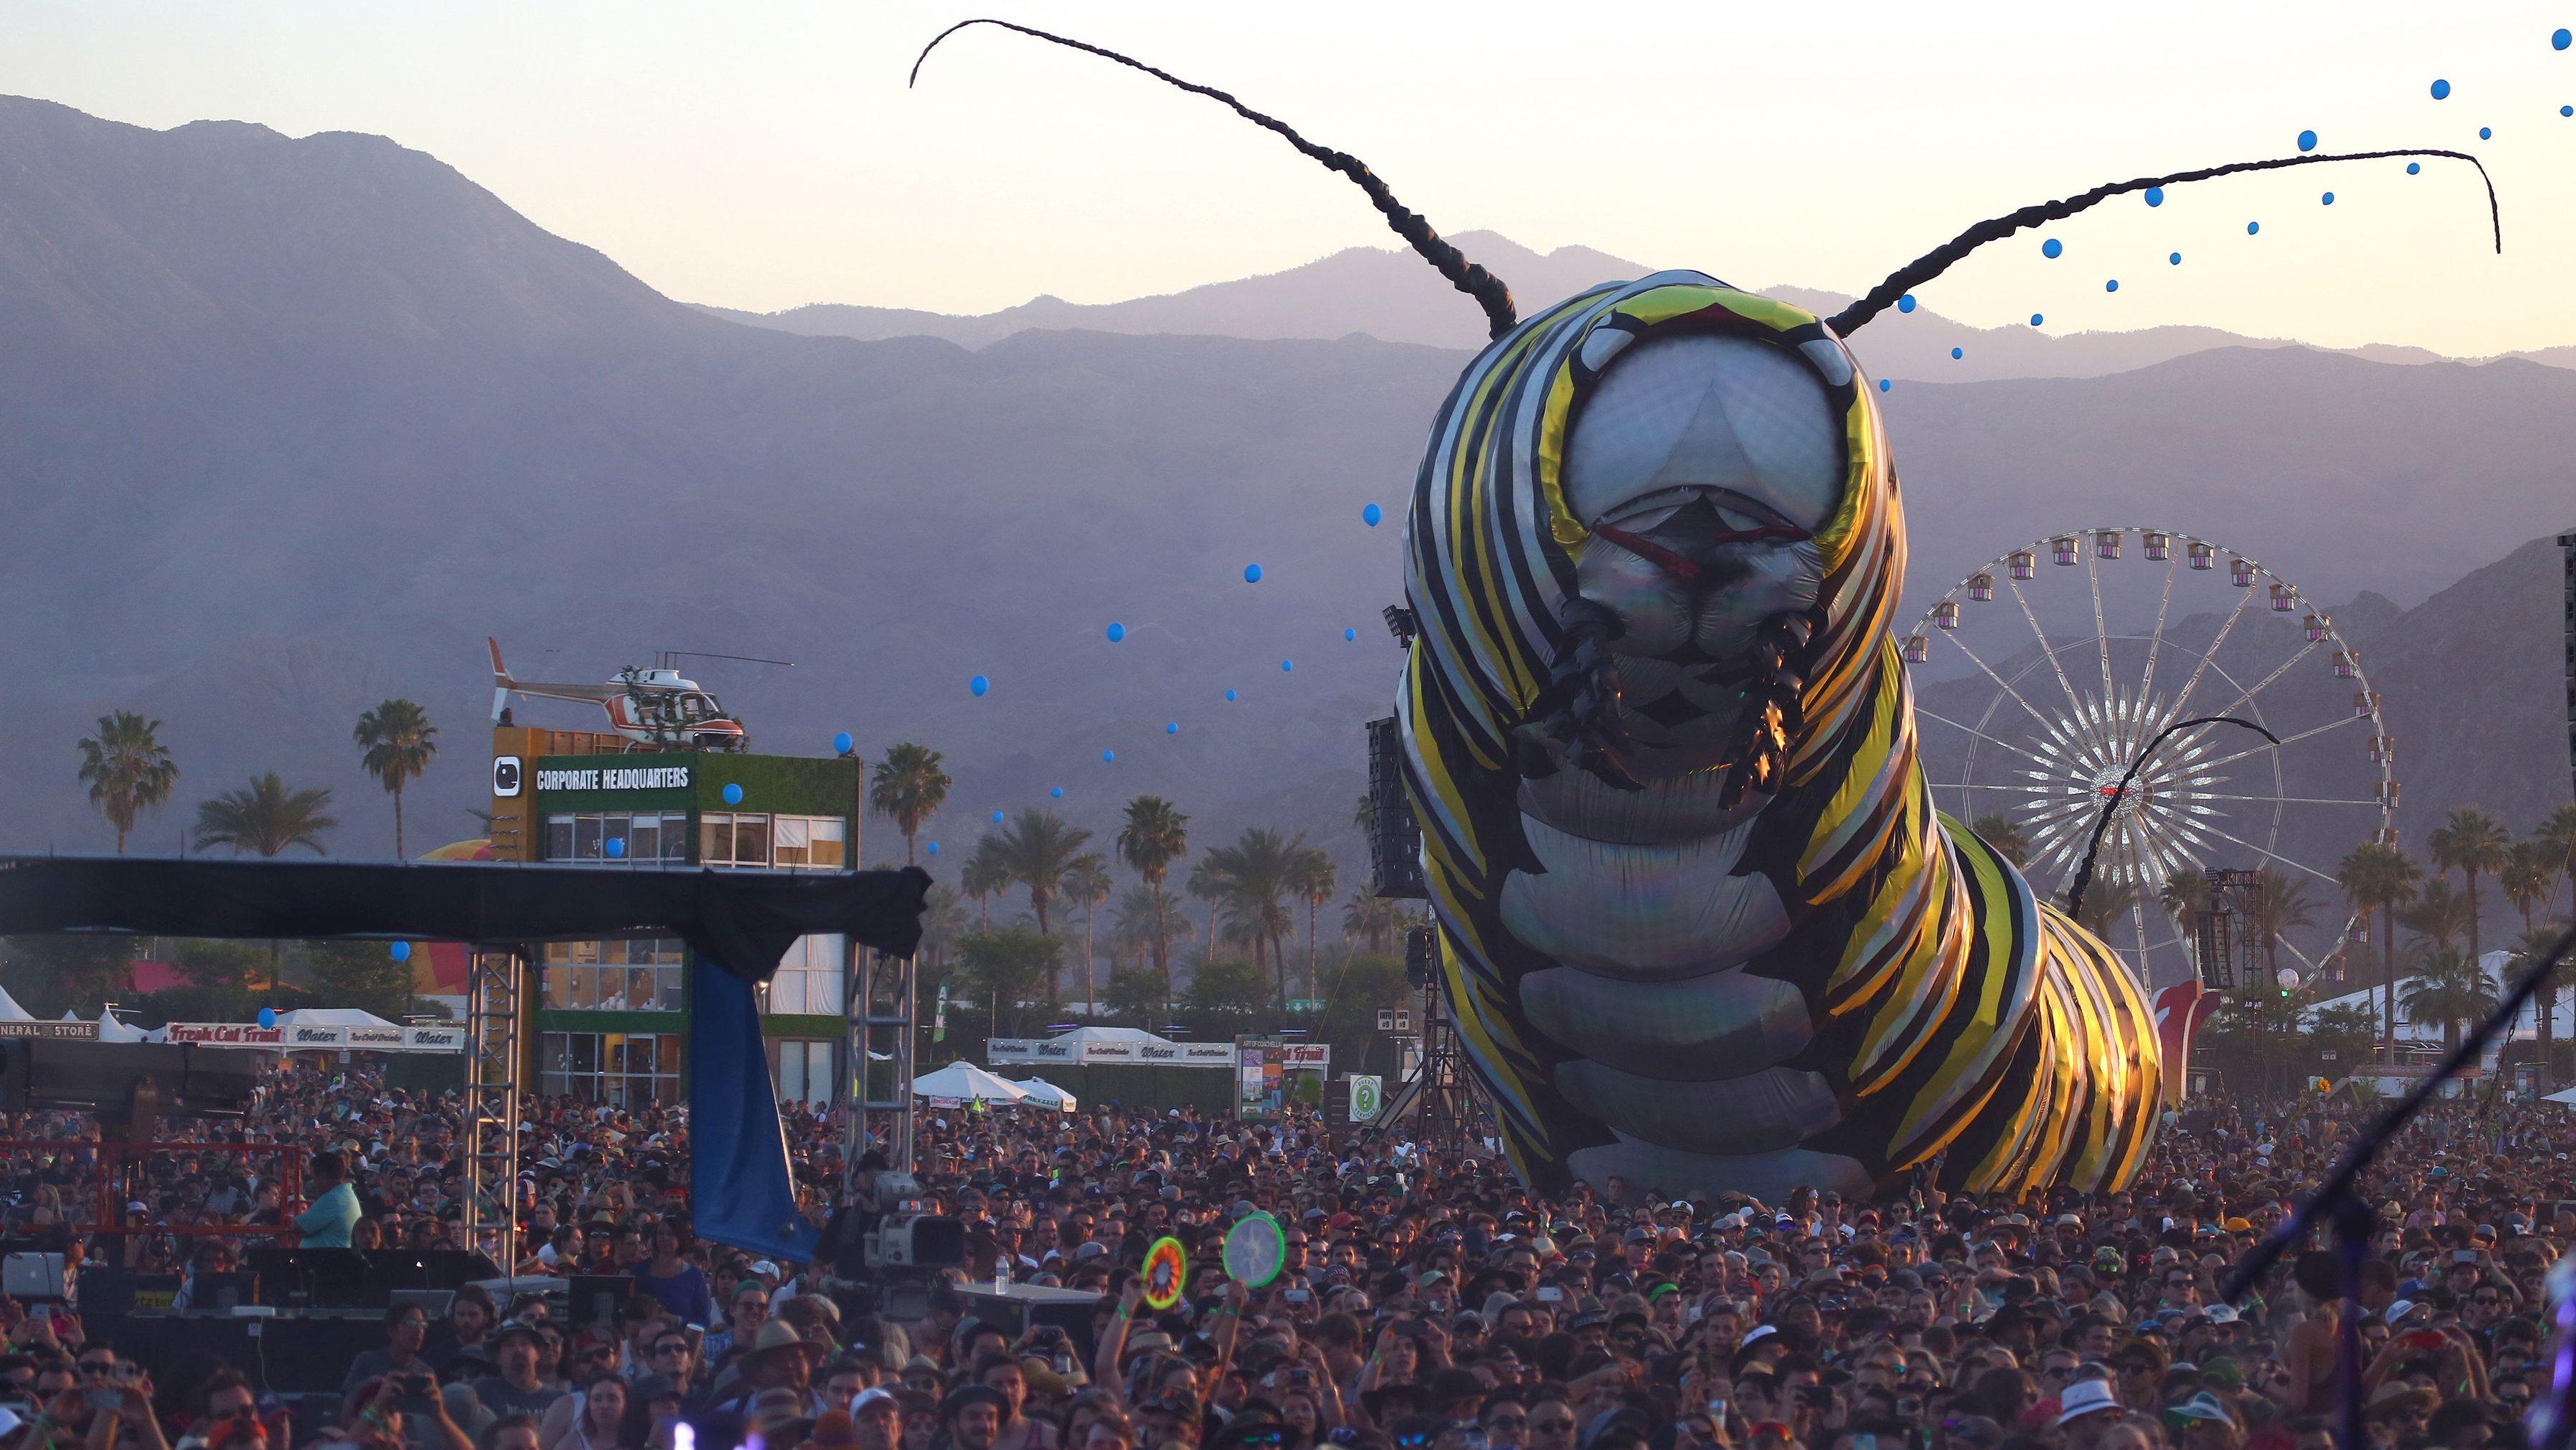 O Festival de Música e Artes Coachella - Fim de semana 2 na sexta-feira, 17 de abril de 2015